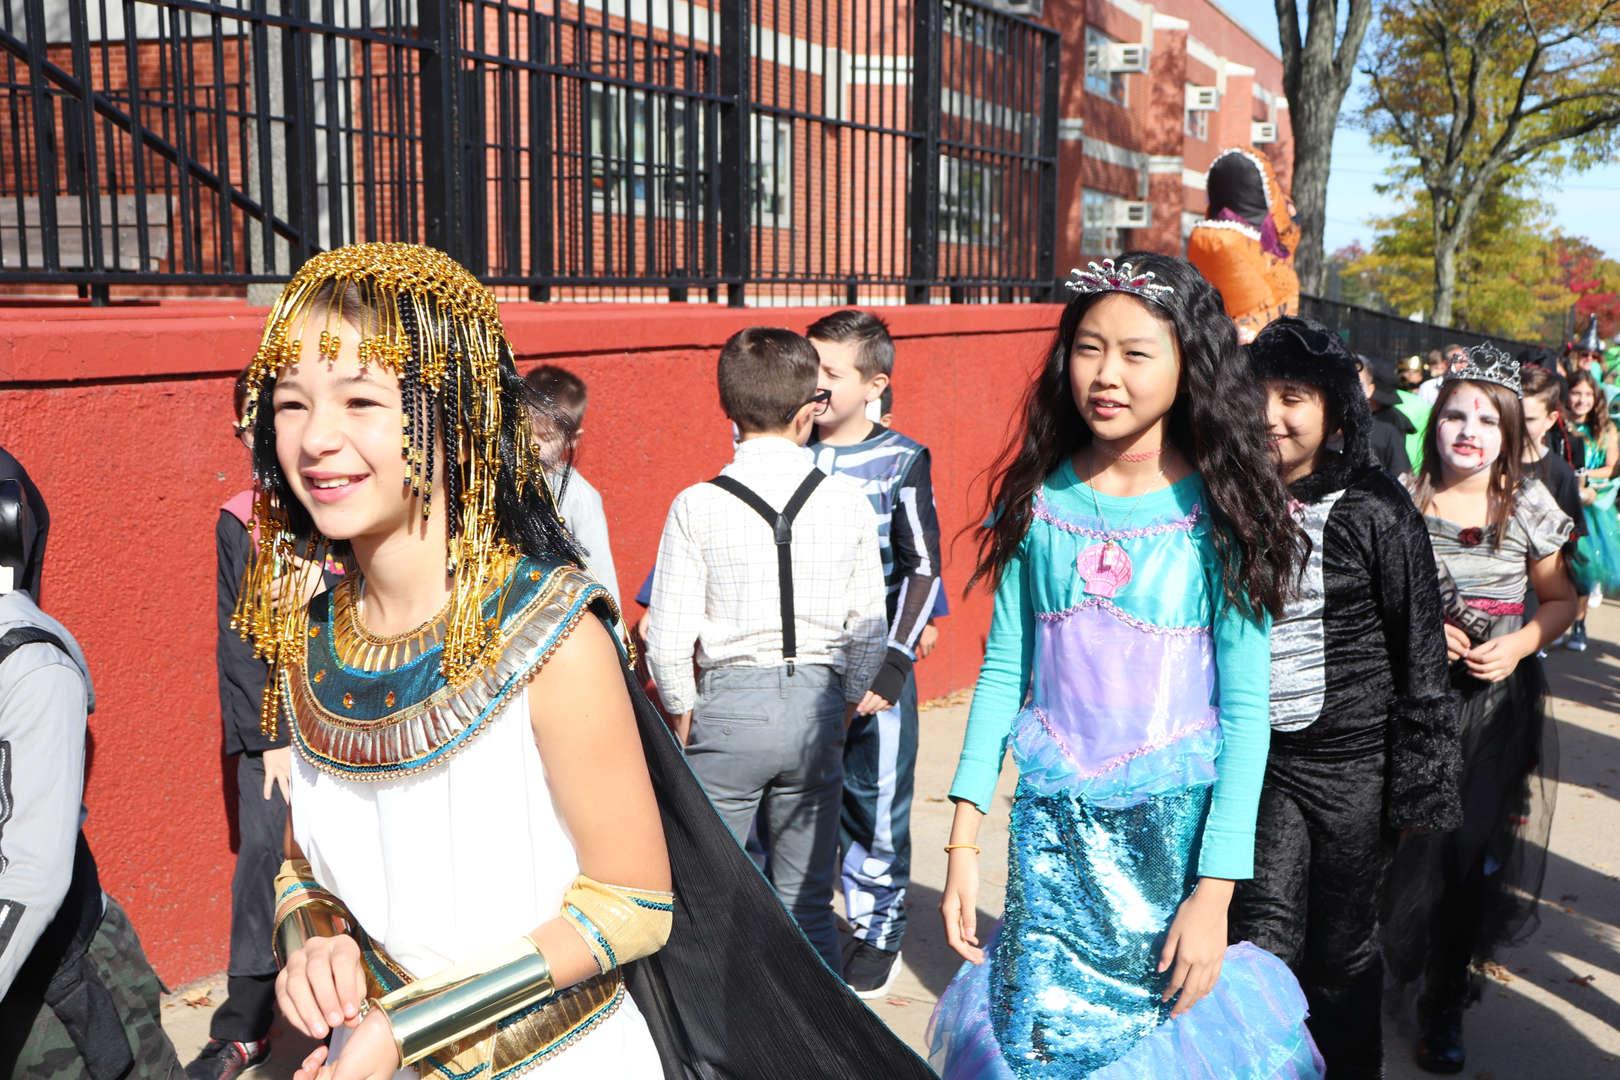 Cleopatra and a princess moving along